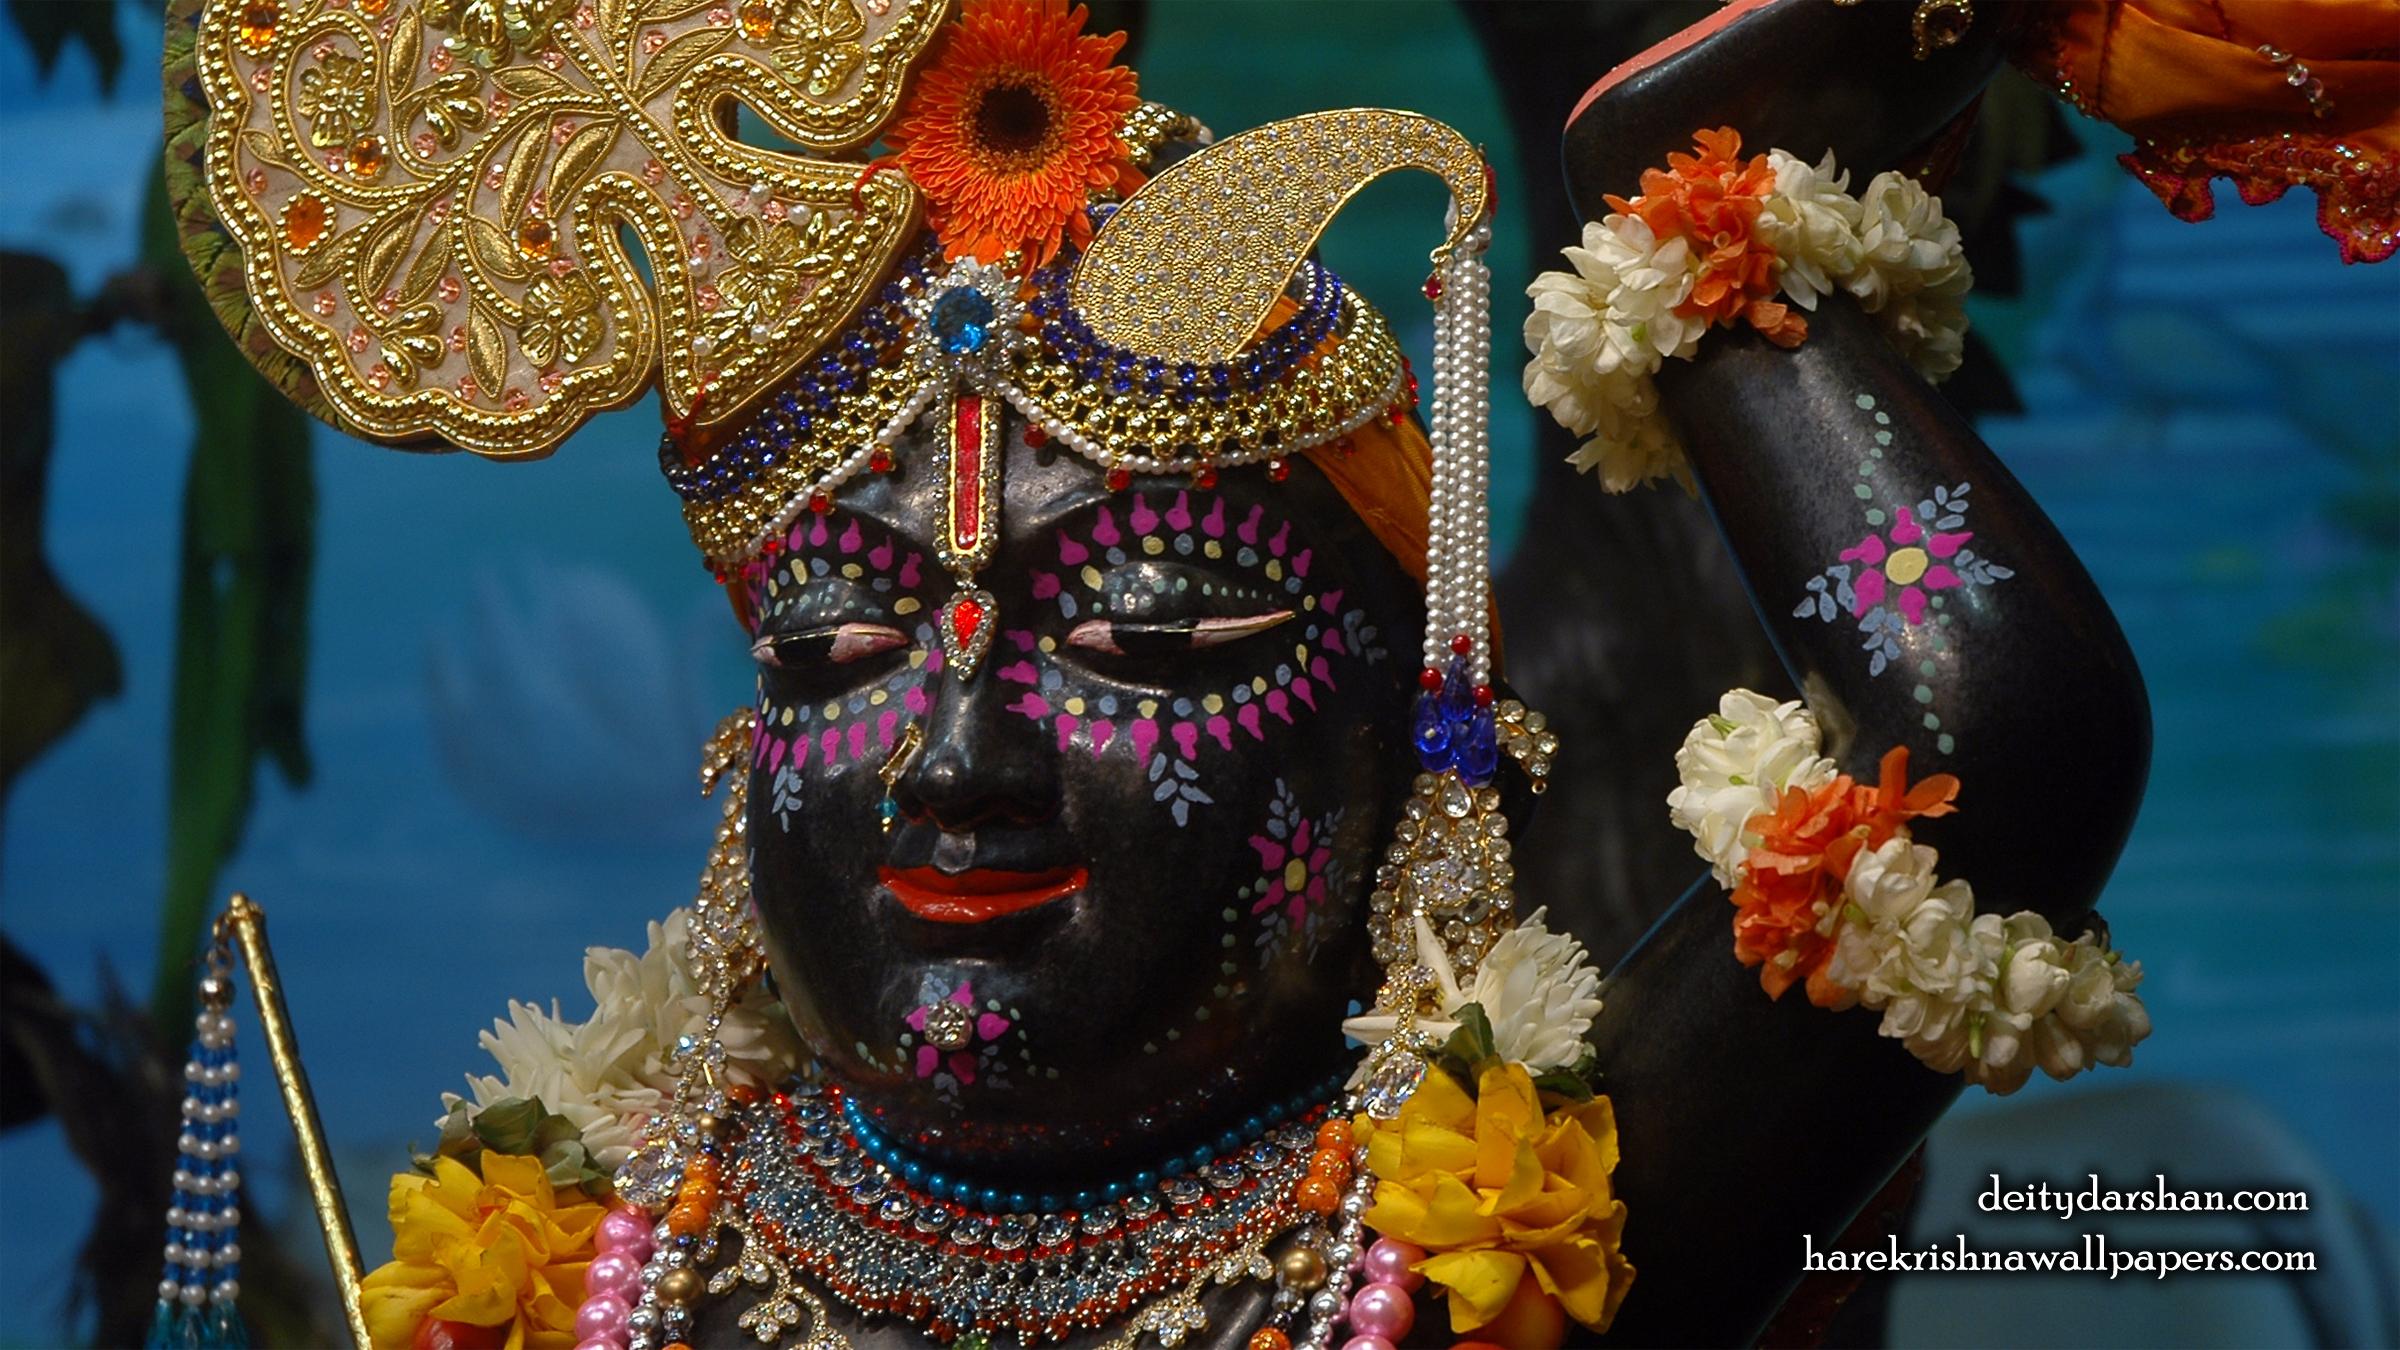 Sri Gopal Close up Wallpaper (045) Size 2400x1350 Download